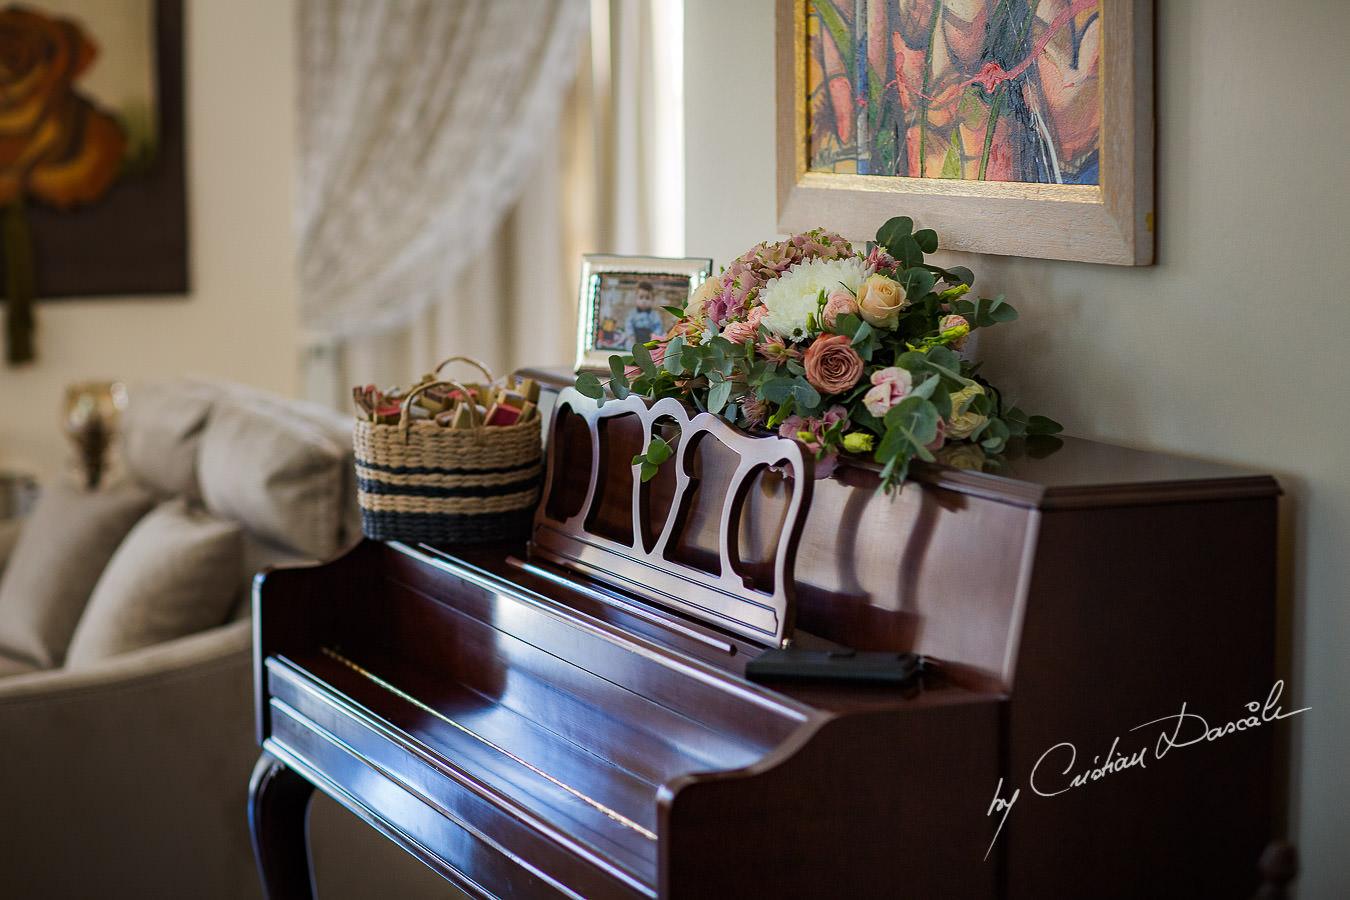 Wedding Flowers captured by Cyprus Wedding Photographer Cristian Dascalu at a beautiful wedding in Larnaka, Cyprus.